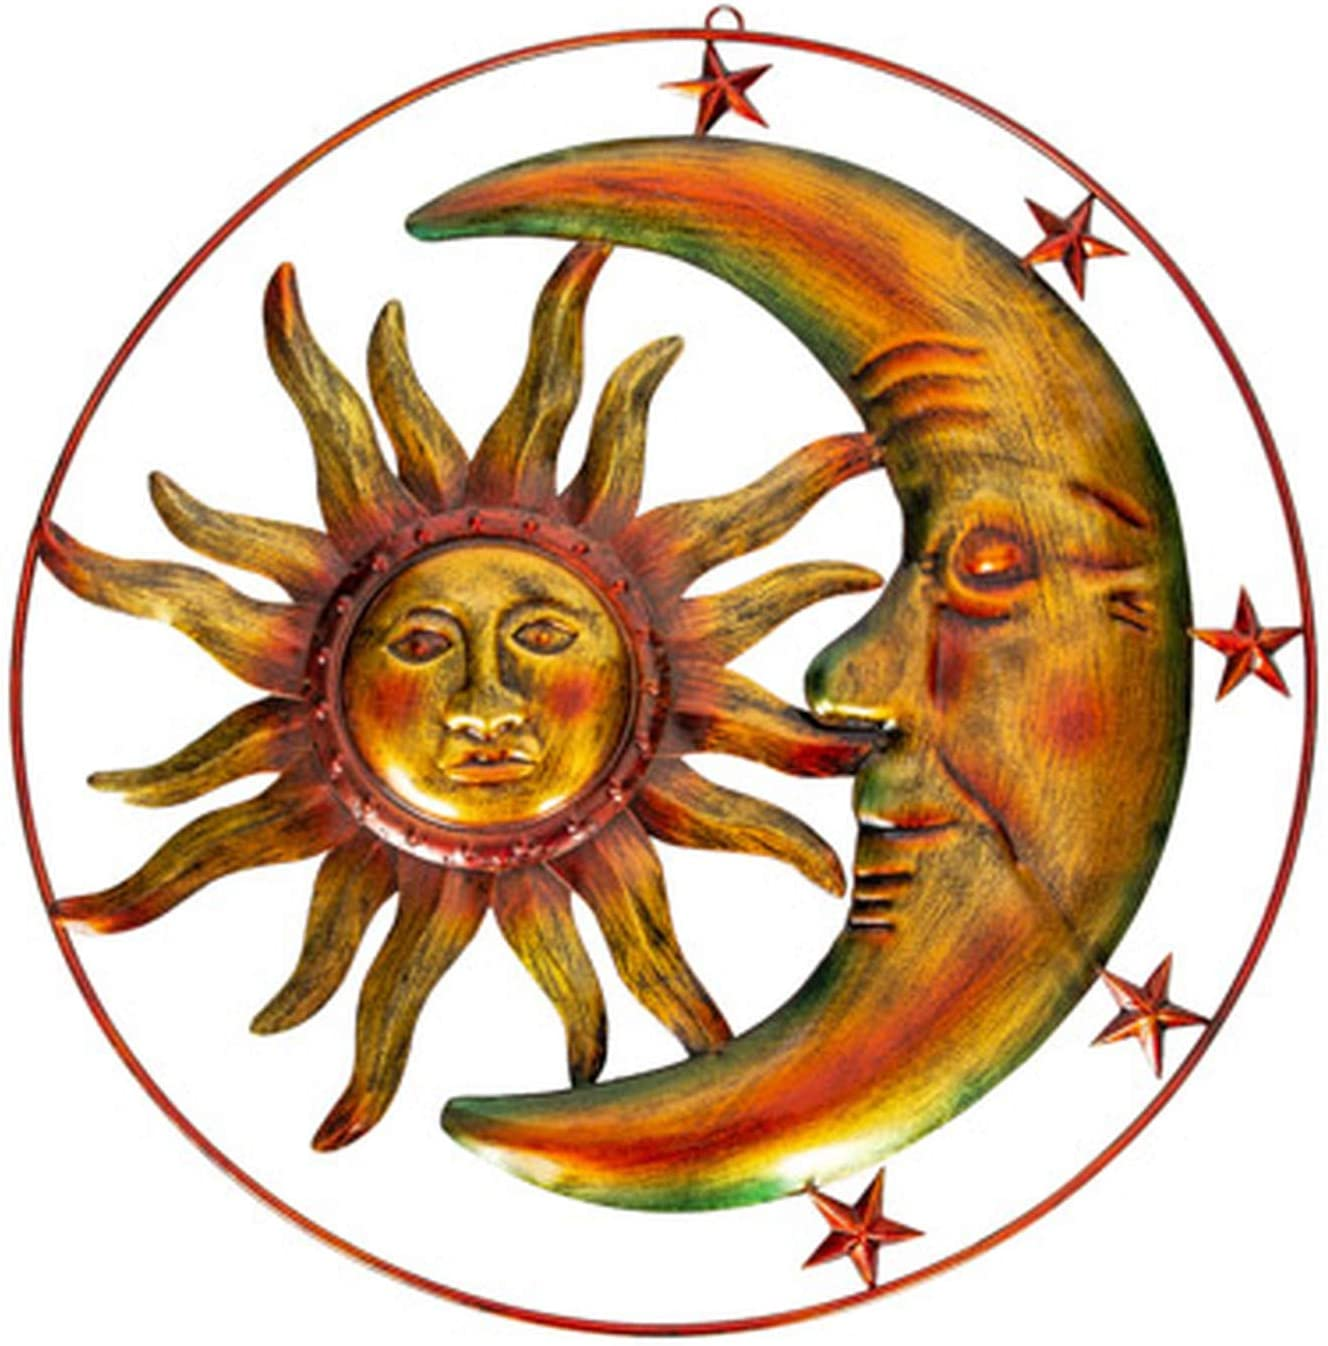 Celestial Sun Moon and Stars Indoor Outdoor 19 inch Wall Hanging Art Decor